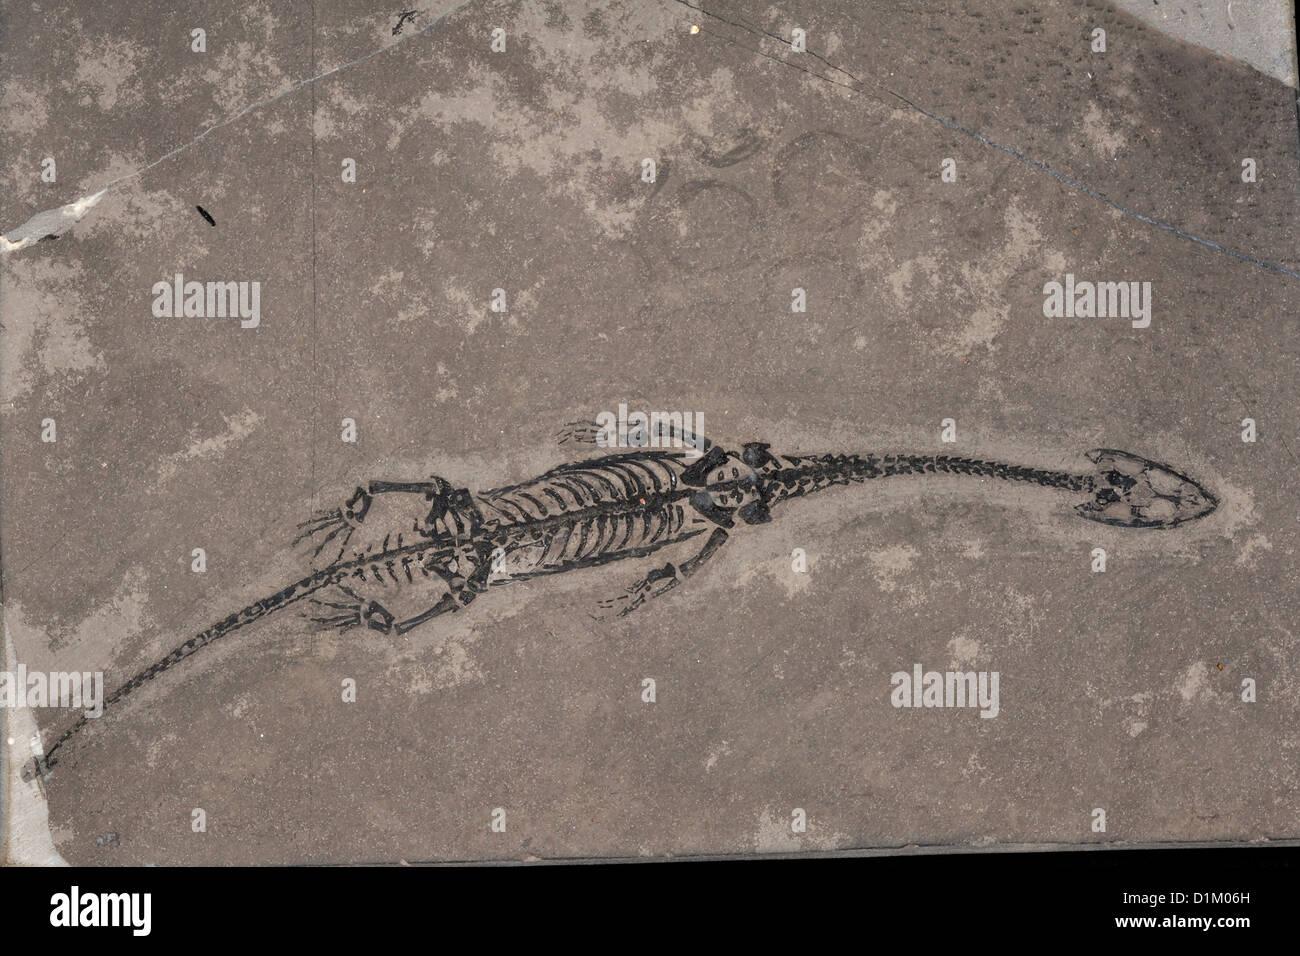 Triásico reptiles fósiles Keichousaurus Hui, China Foto de stock